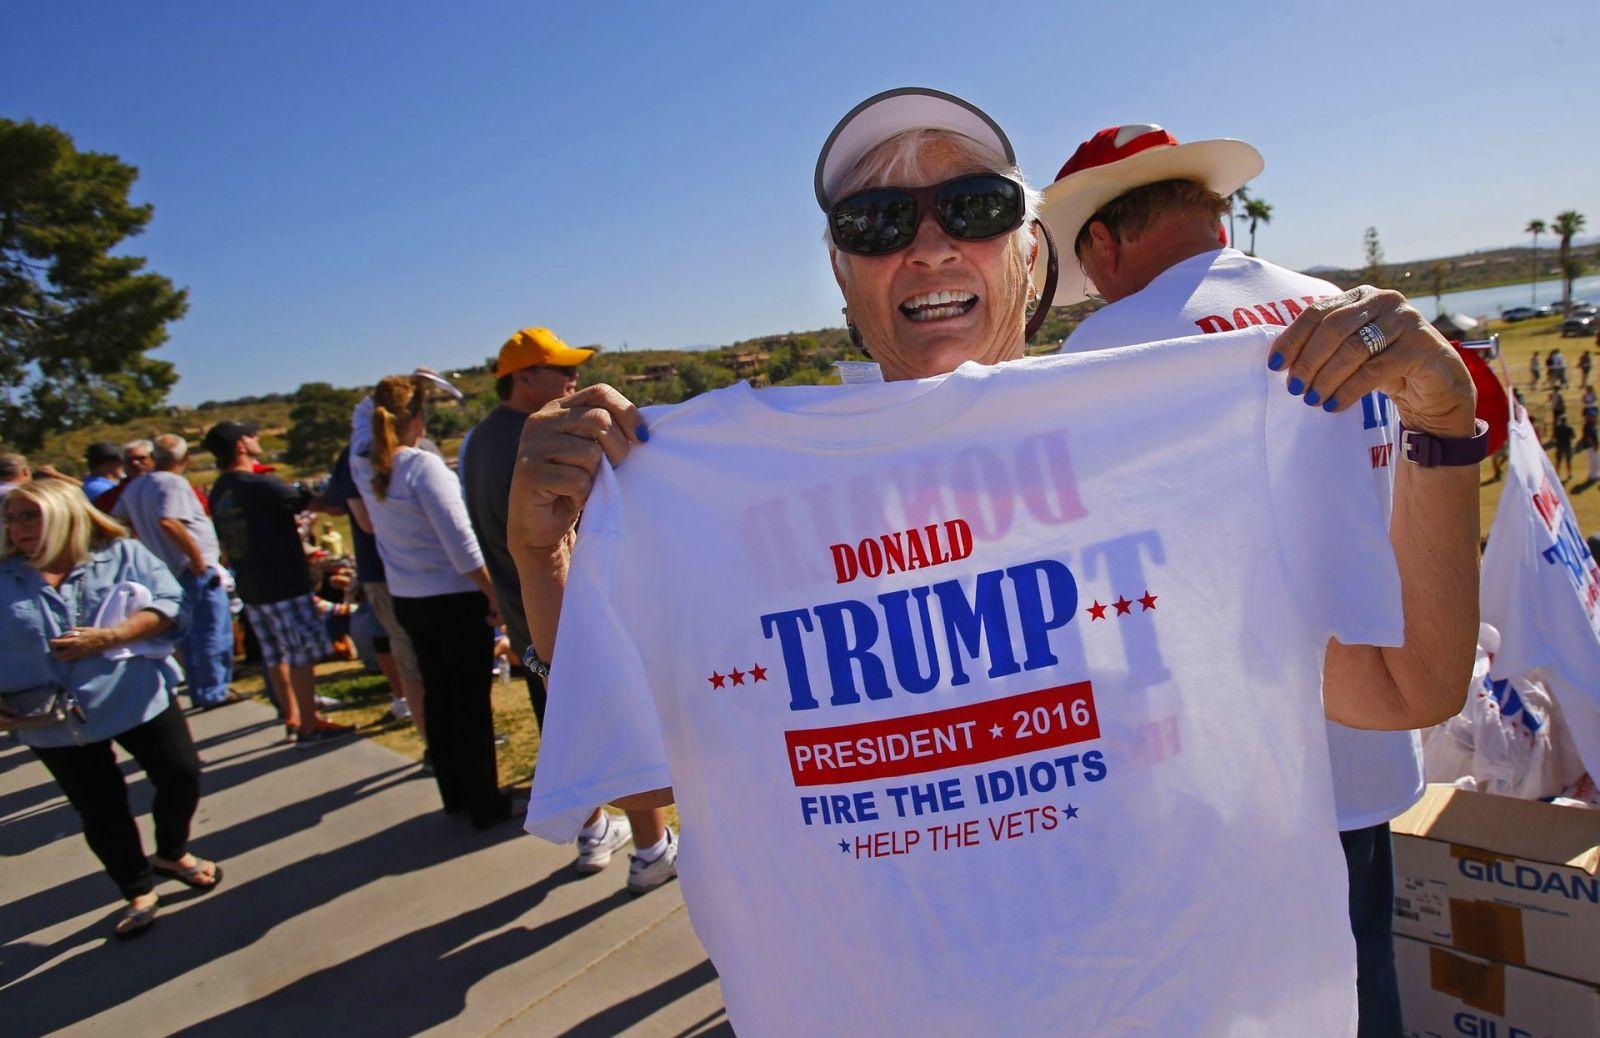 Protestors met Trump in Arizona